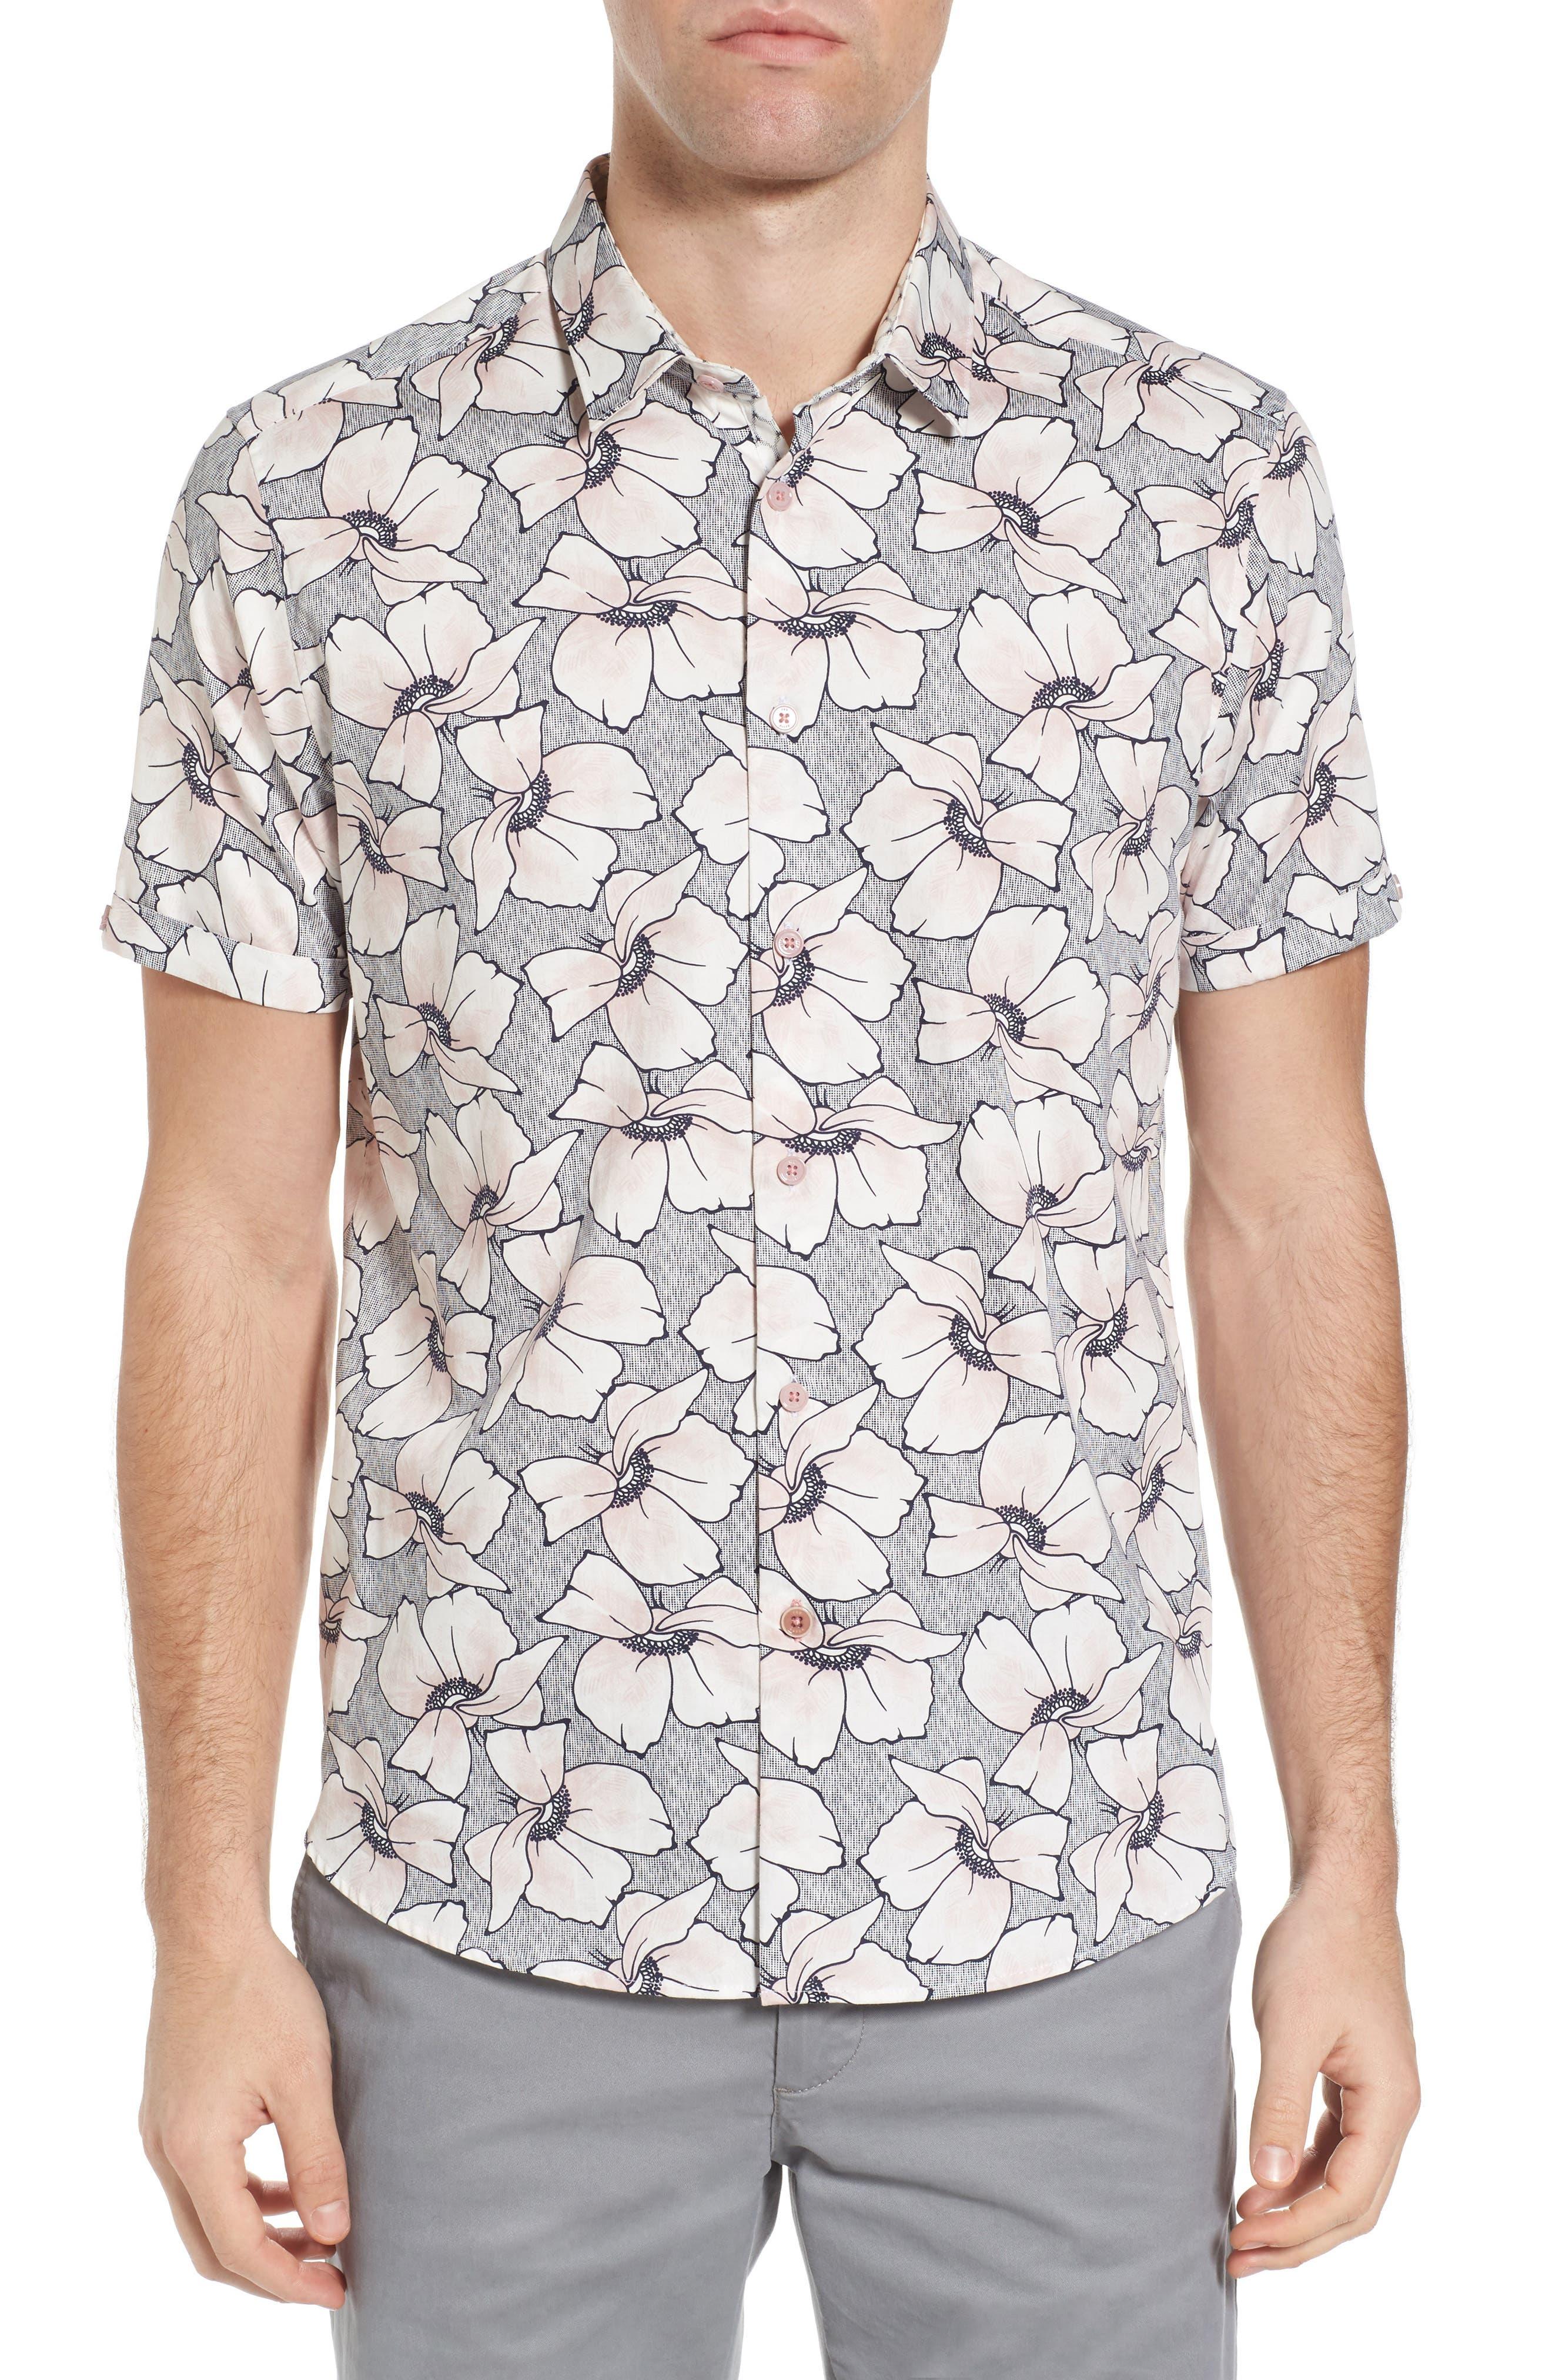 TED BAKER LONDON Bigflo Floral Short Sleeve Sport Shirt, Main, color, 683